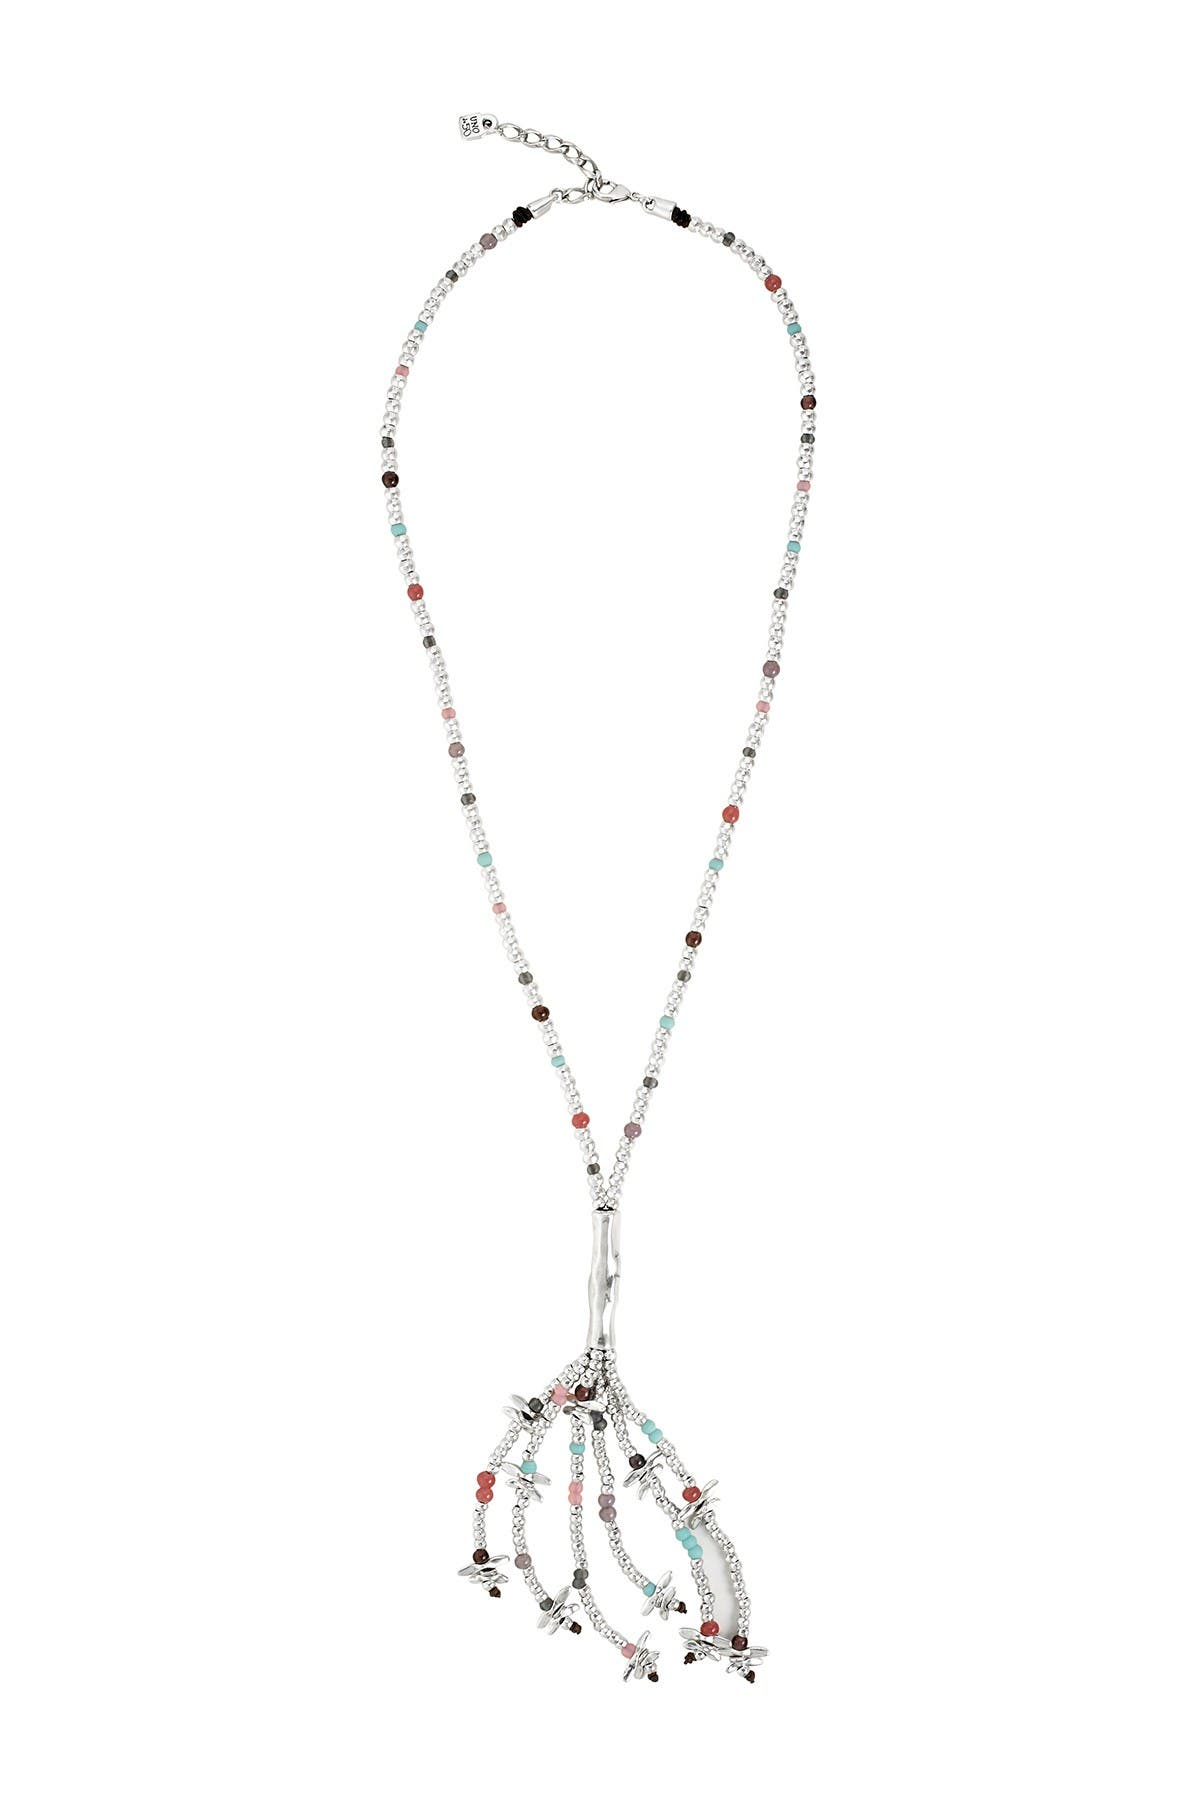 Image of Uno De 50 Feelings Dragonfly Tassel Necklace